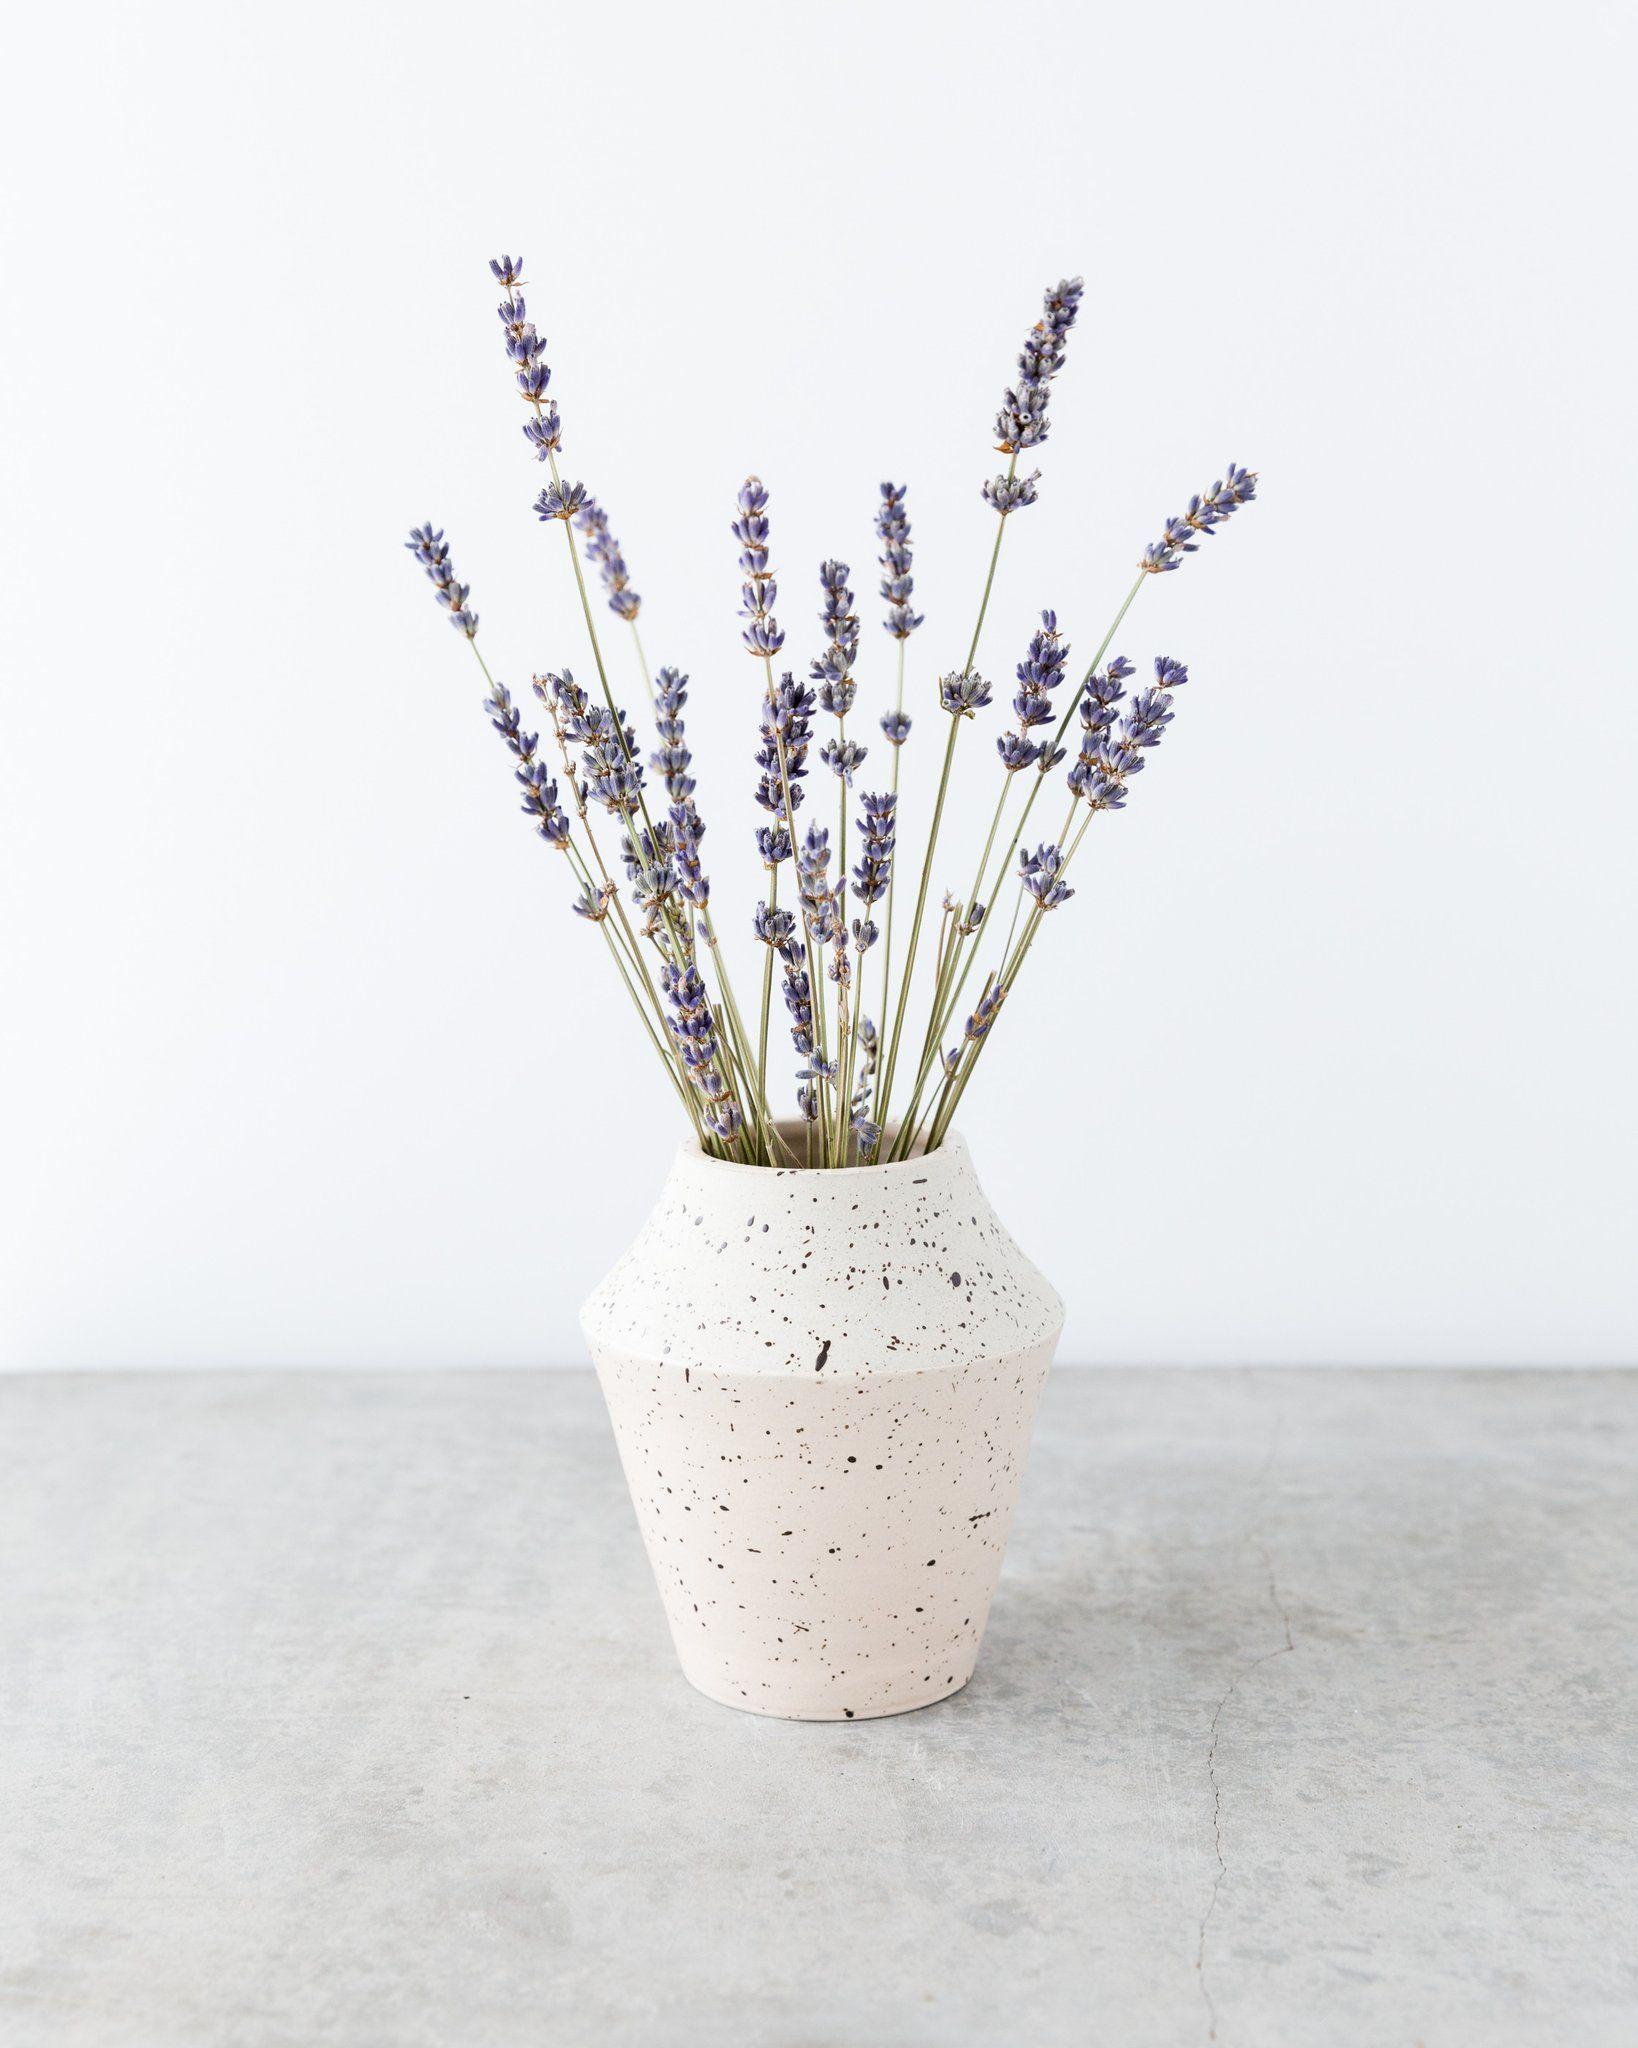 Mérida Anderson Medium Angular Speckled Vase in Blush and Natural